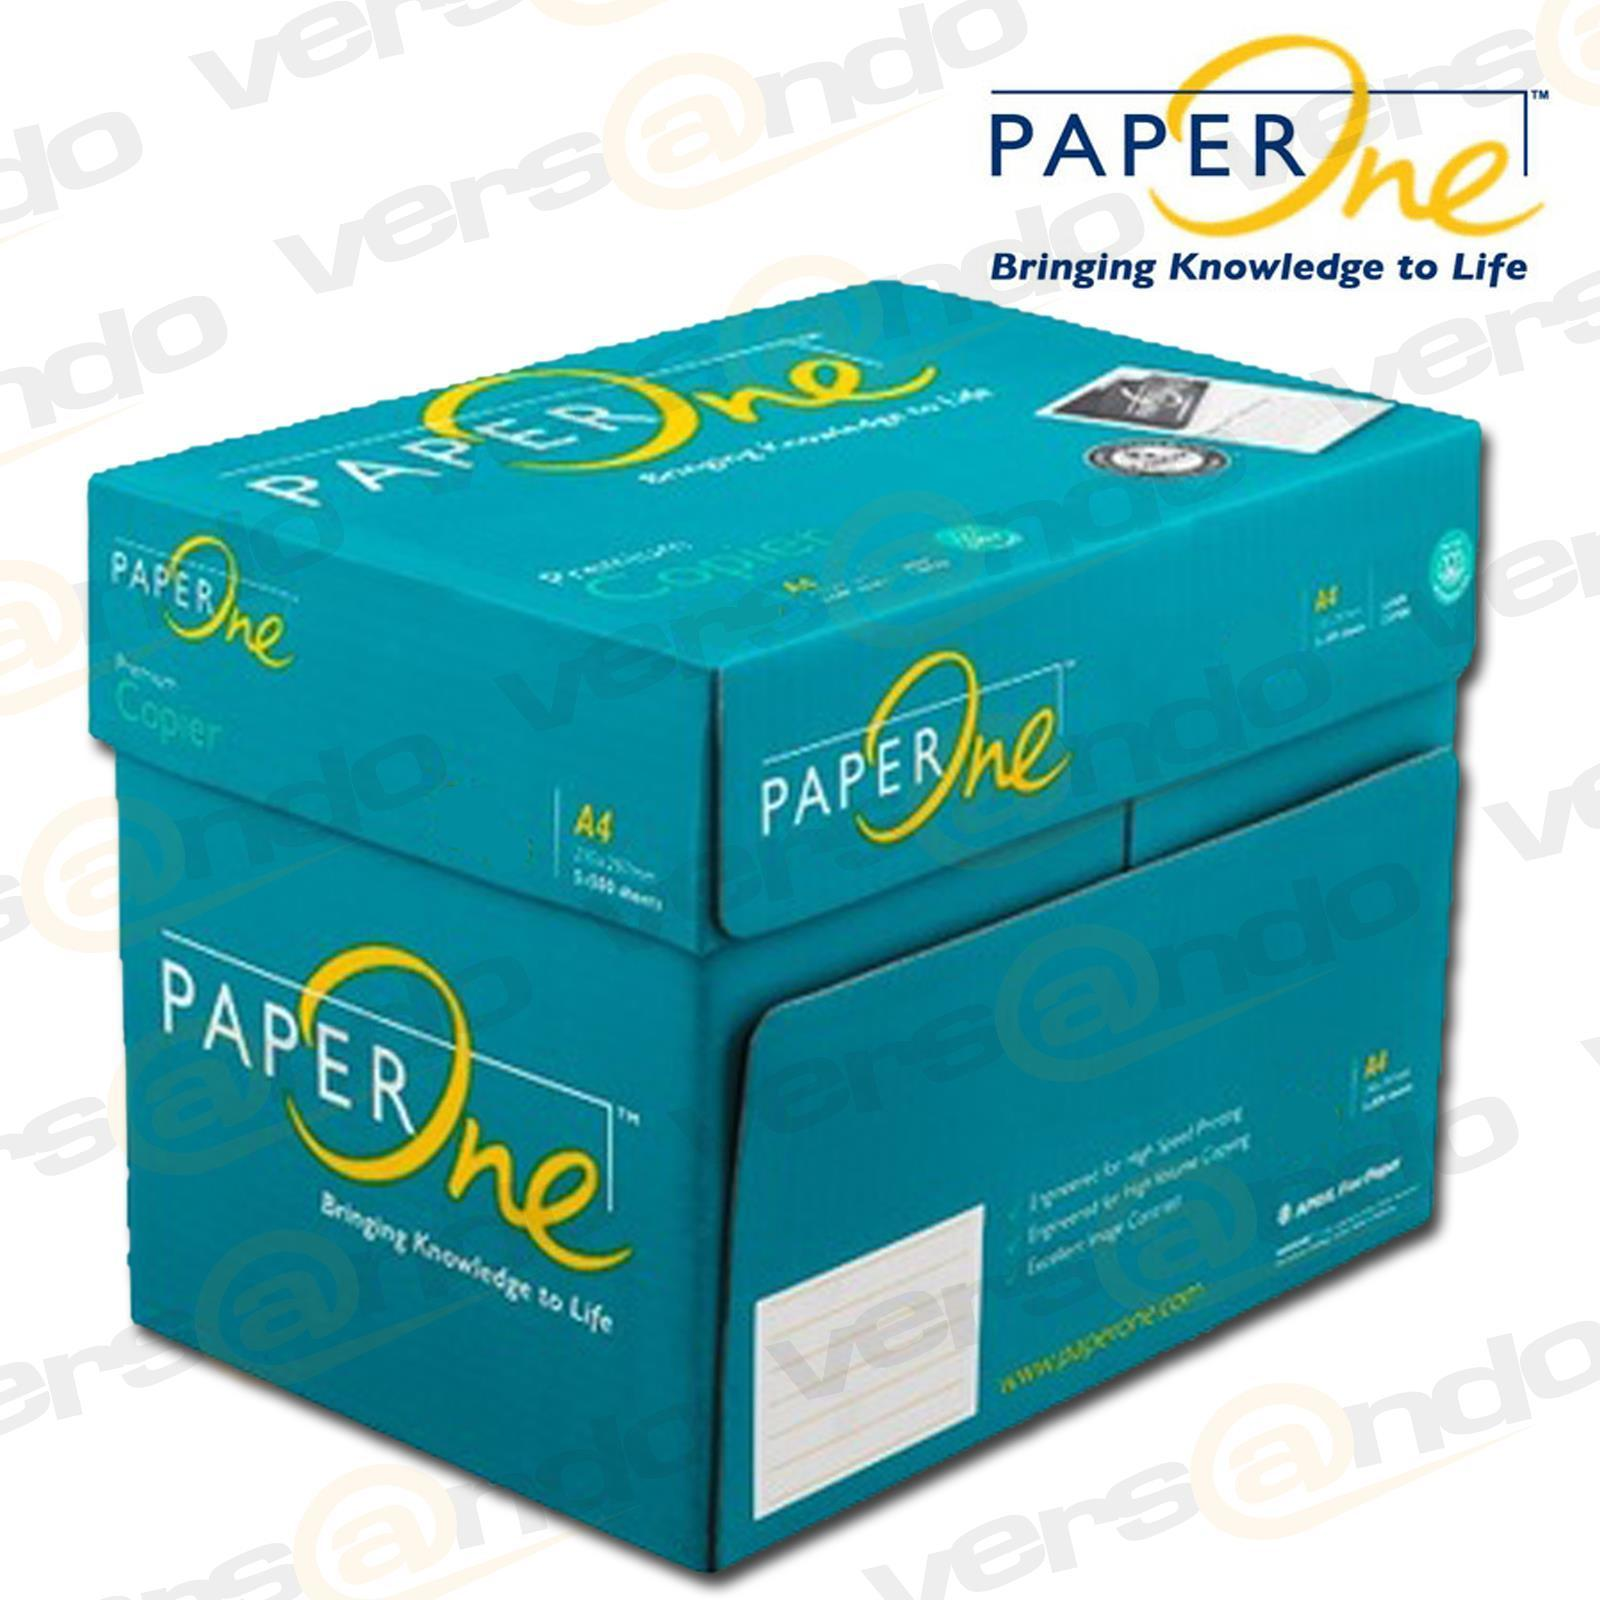 2500 Blatt PAPIER Marke Paper One DIN A4 weiß KOPIERPAPIER DRUCKERPAPIER Seiten